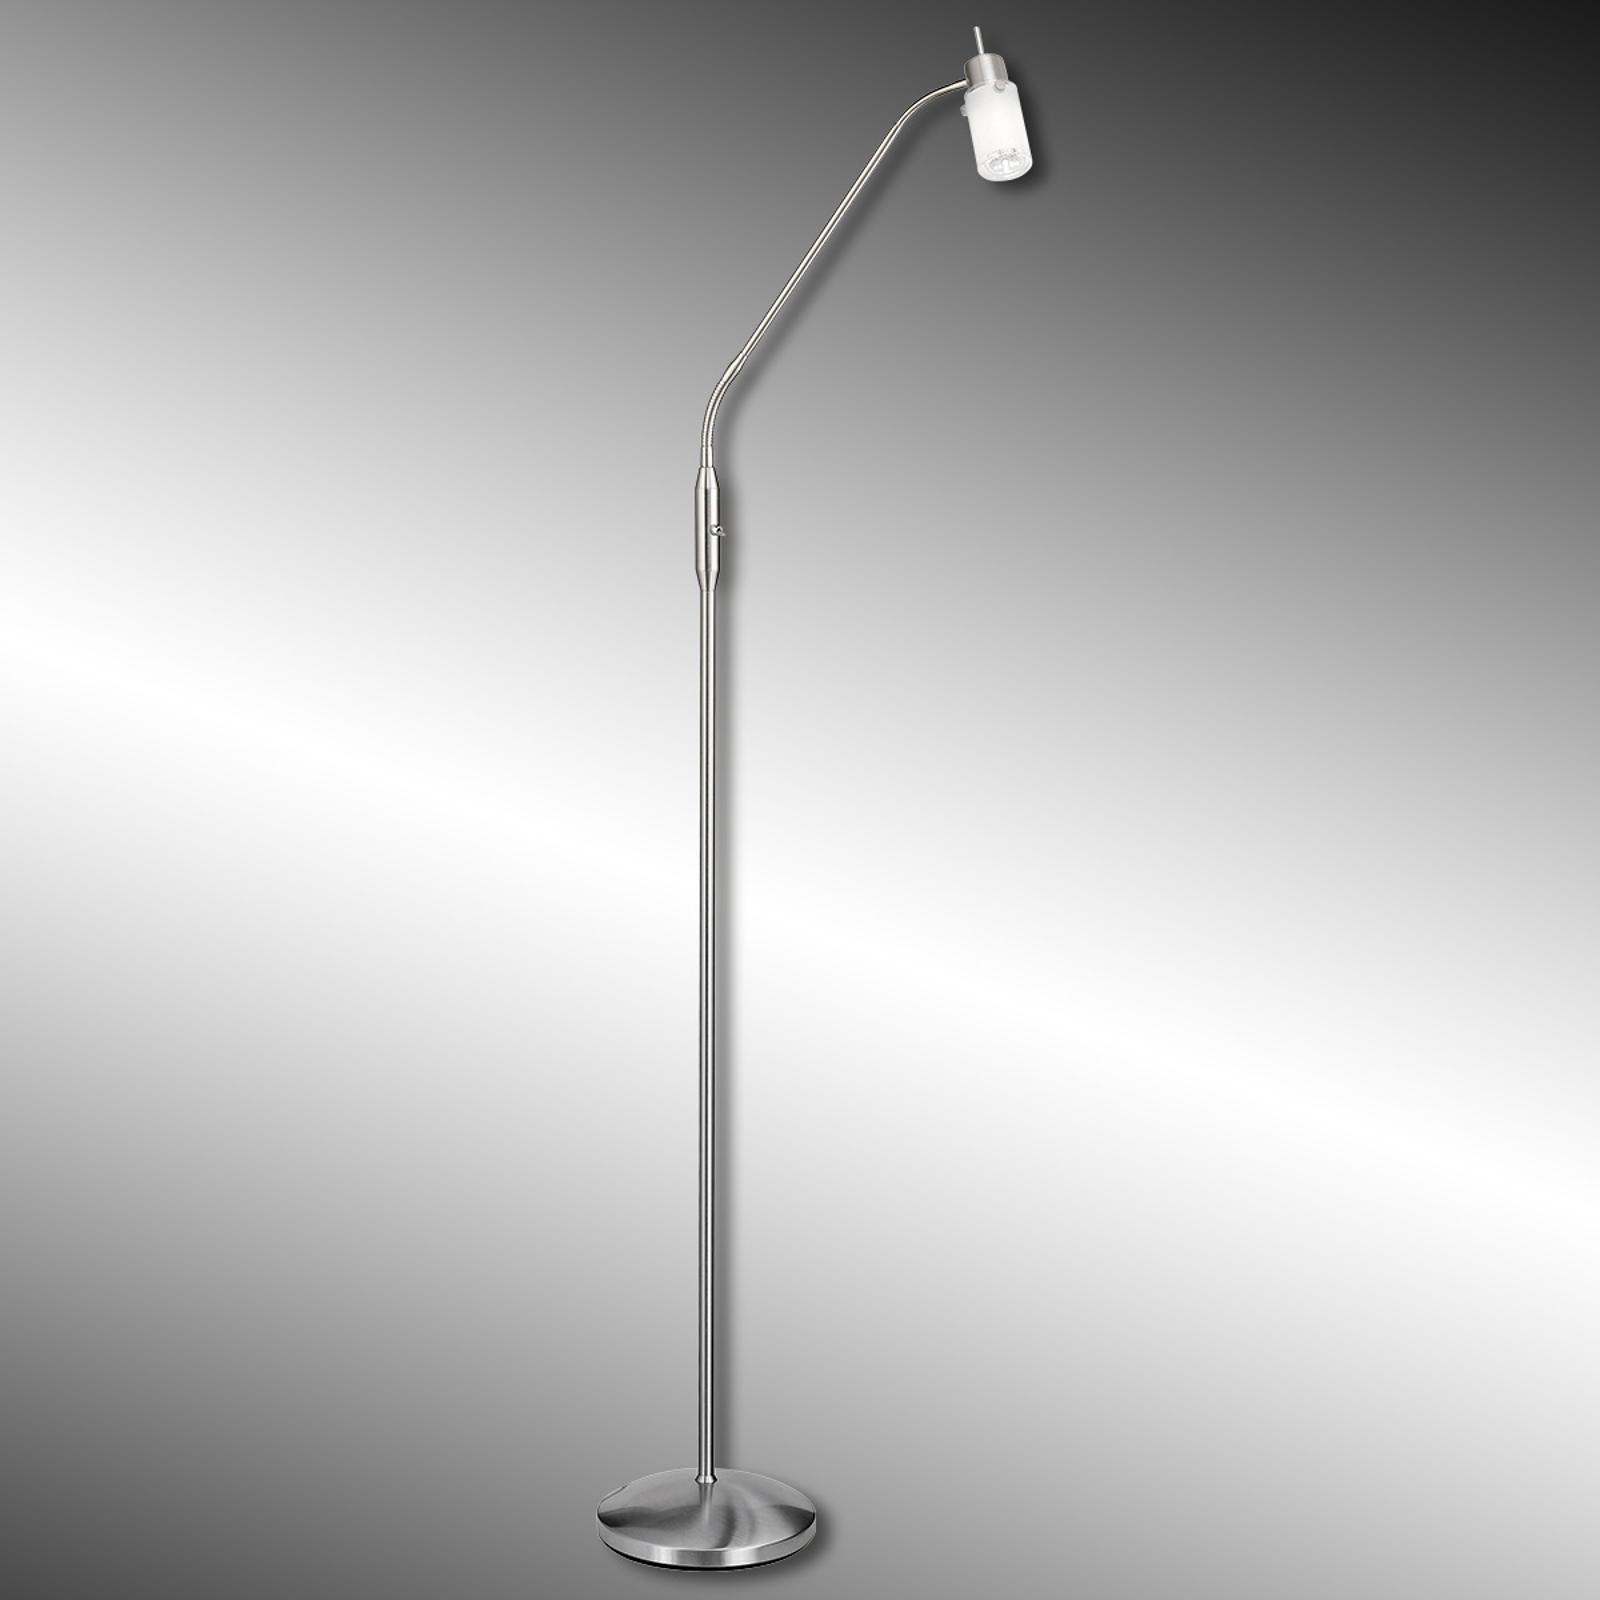 Jednopunktowa lampa stojąca LED MAX